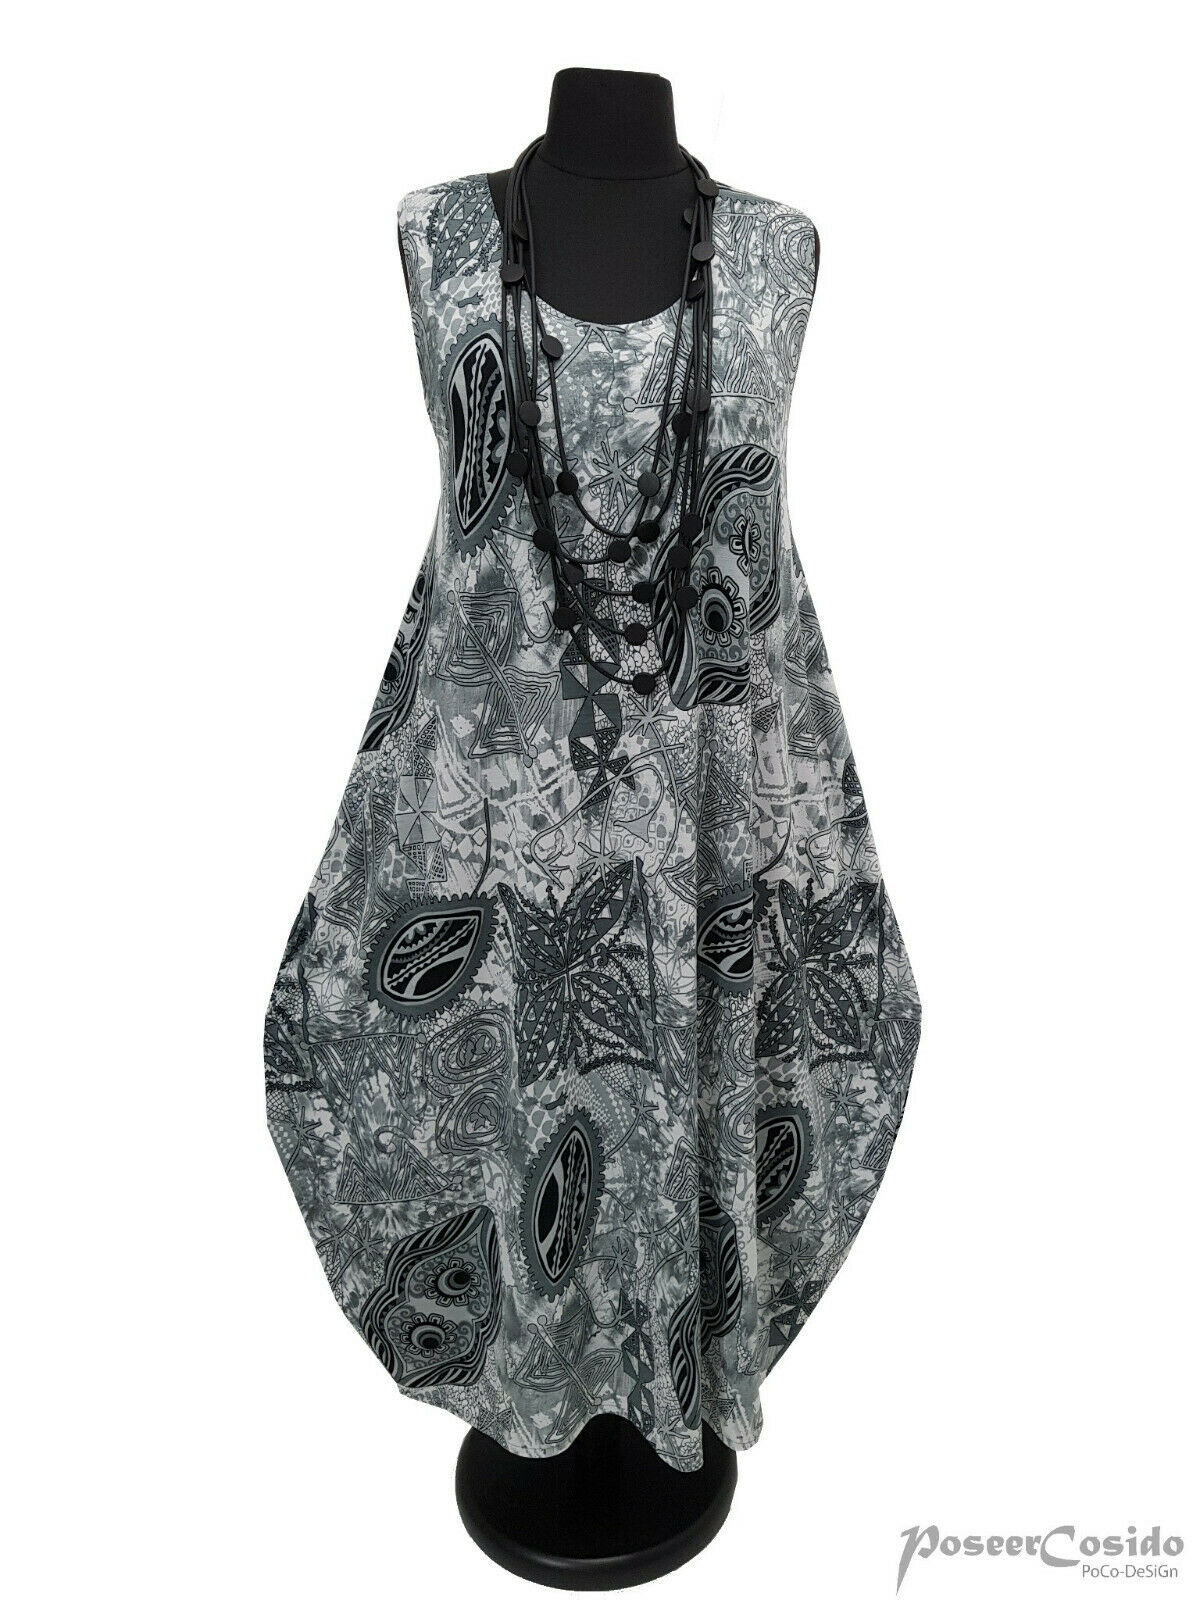 LAGENLOOK Ballon-Kleid grau weiß schwarz L-XL-XXL-XXXL 44 46 48 50 52 54 56 58